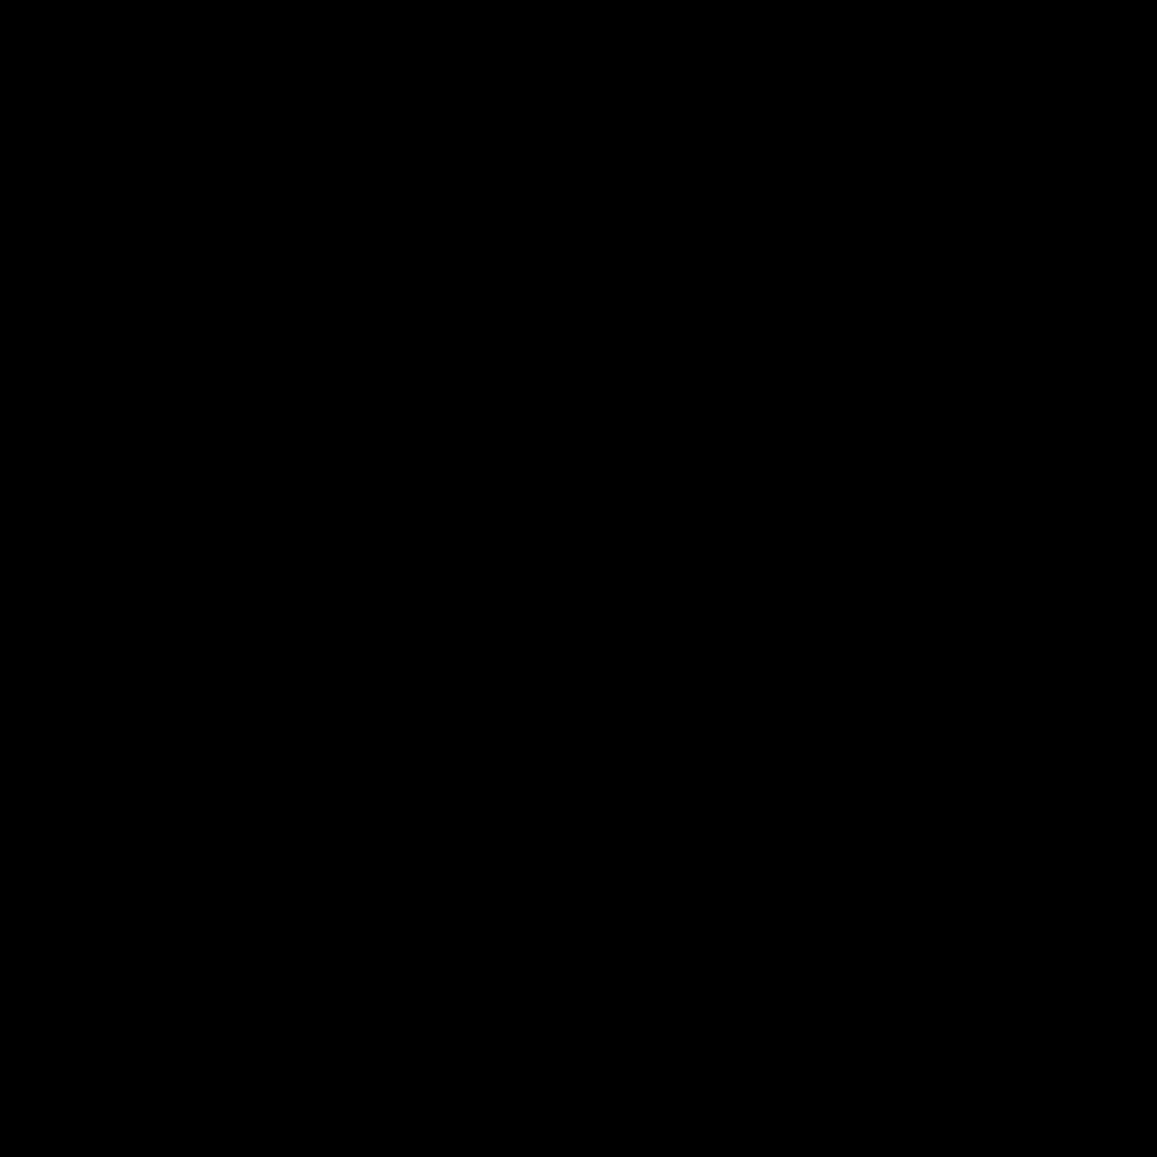 Bague rétro strass Swarovski vert émeraude réglable